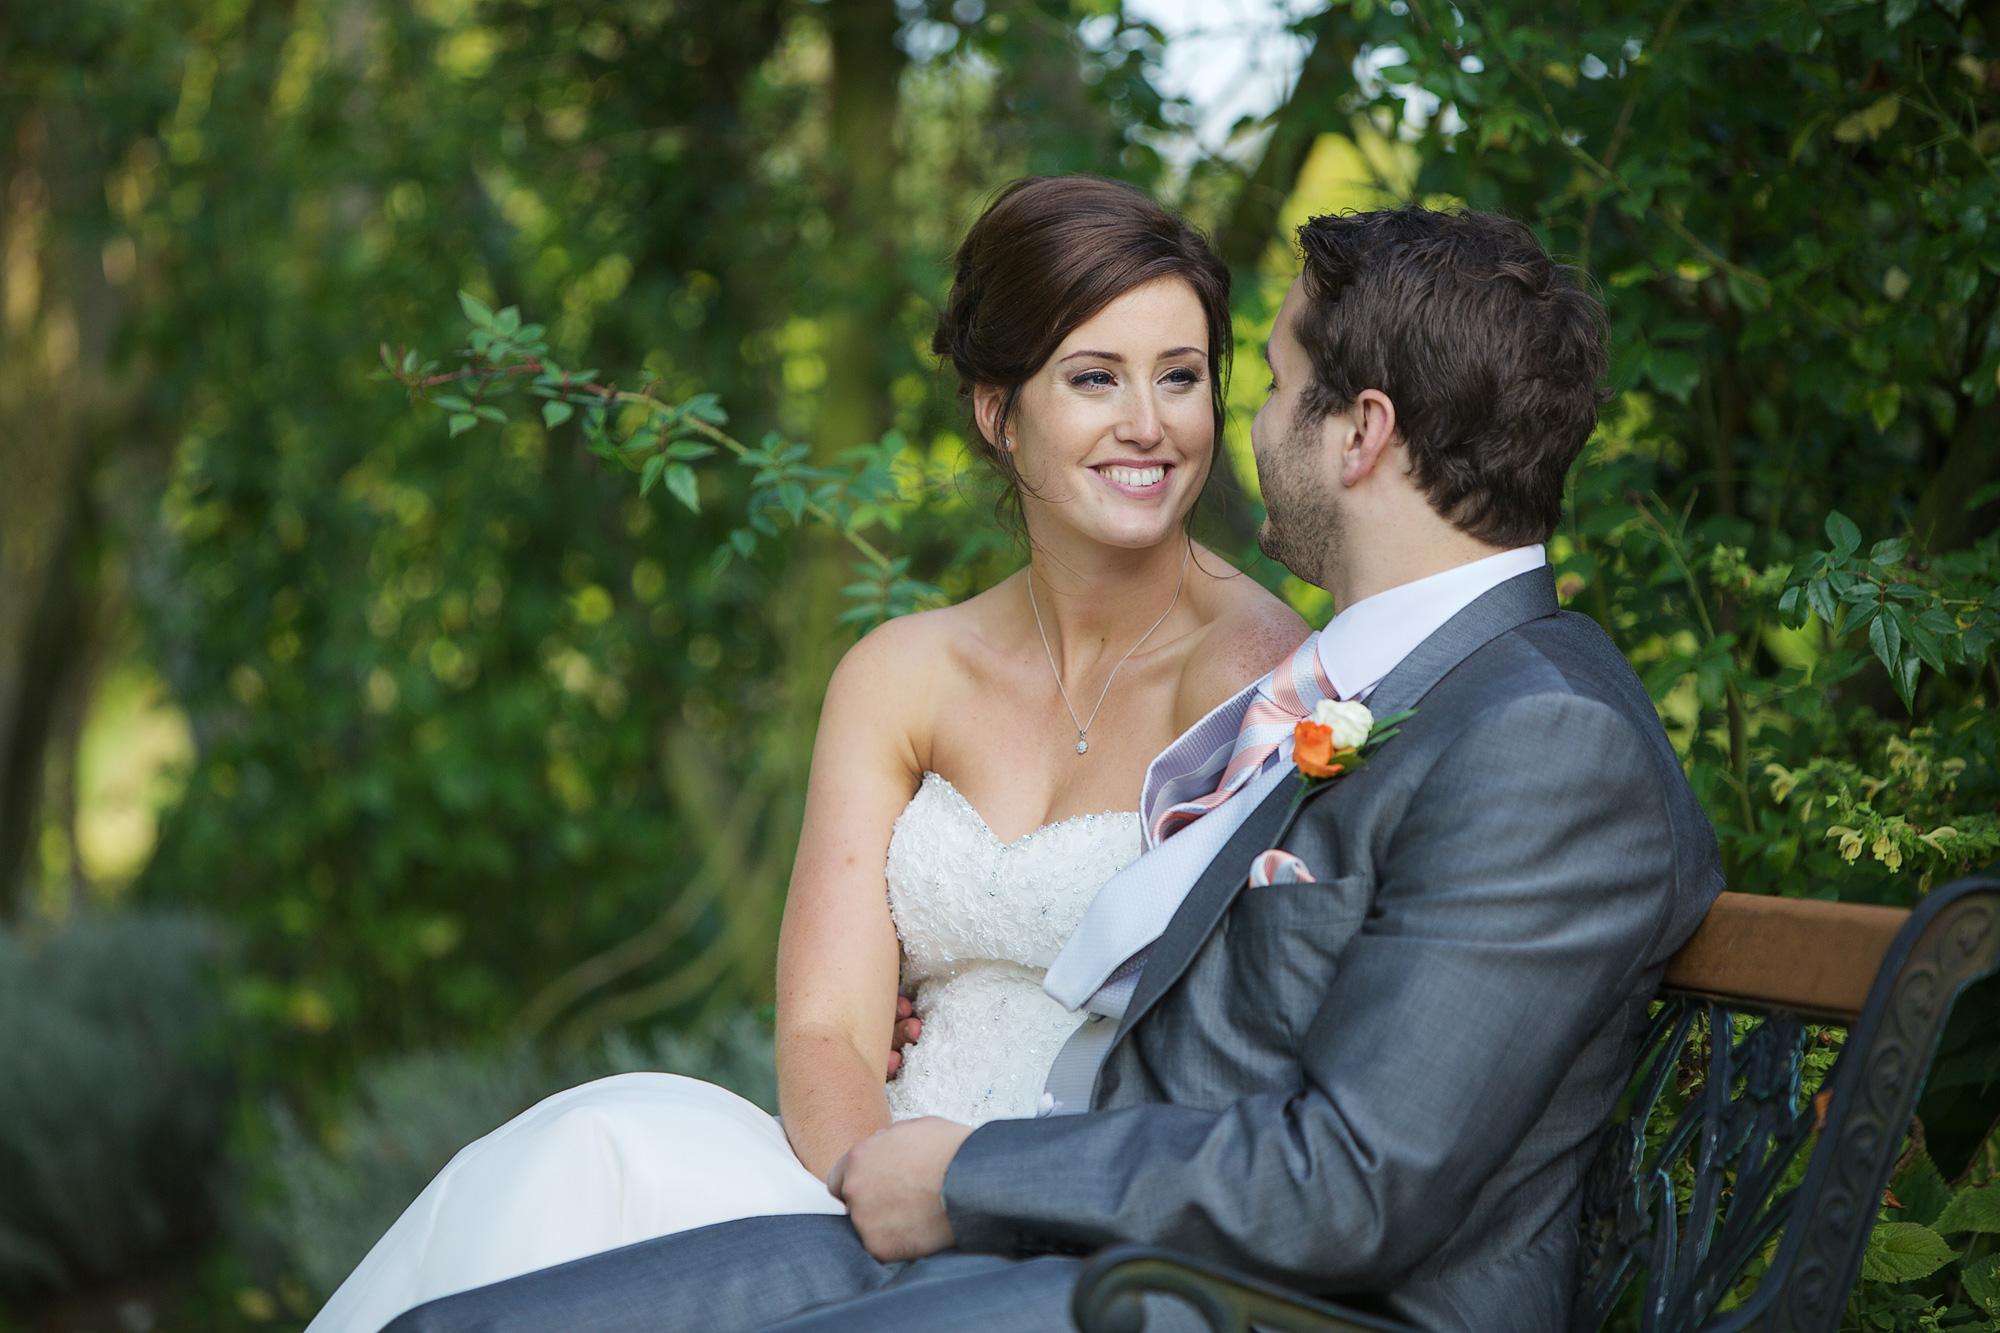 Adam_Hillier_Wedding_Photographer_Newbury_Berkshire_5 (7).jpg